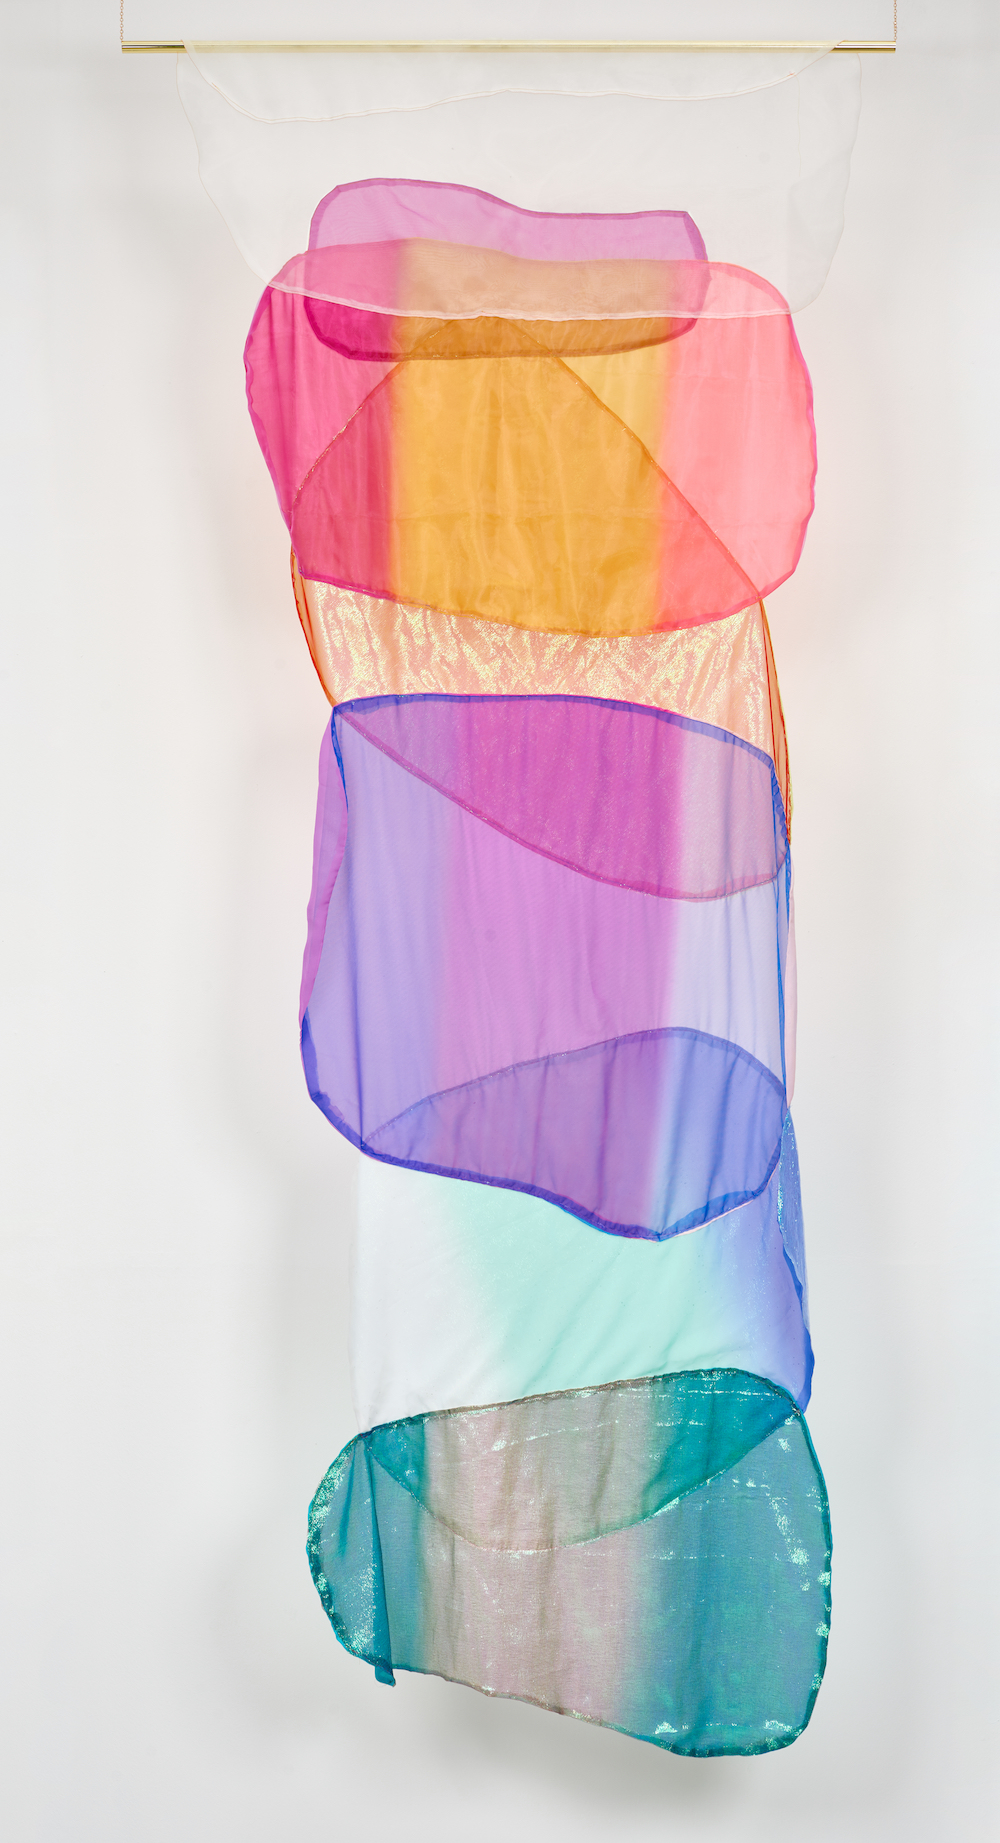 Ludovica Gioscia, Generous Oak, 2019. Fabric, thread and metal pole. 275 x 122 cm. Photographer Jonathon Bassett.